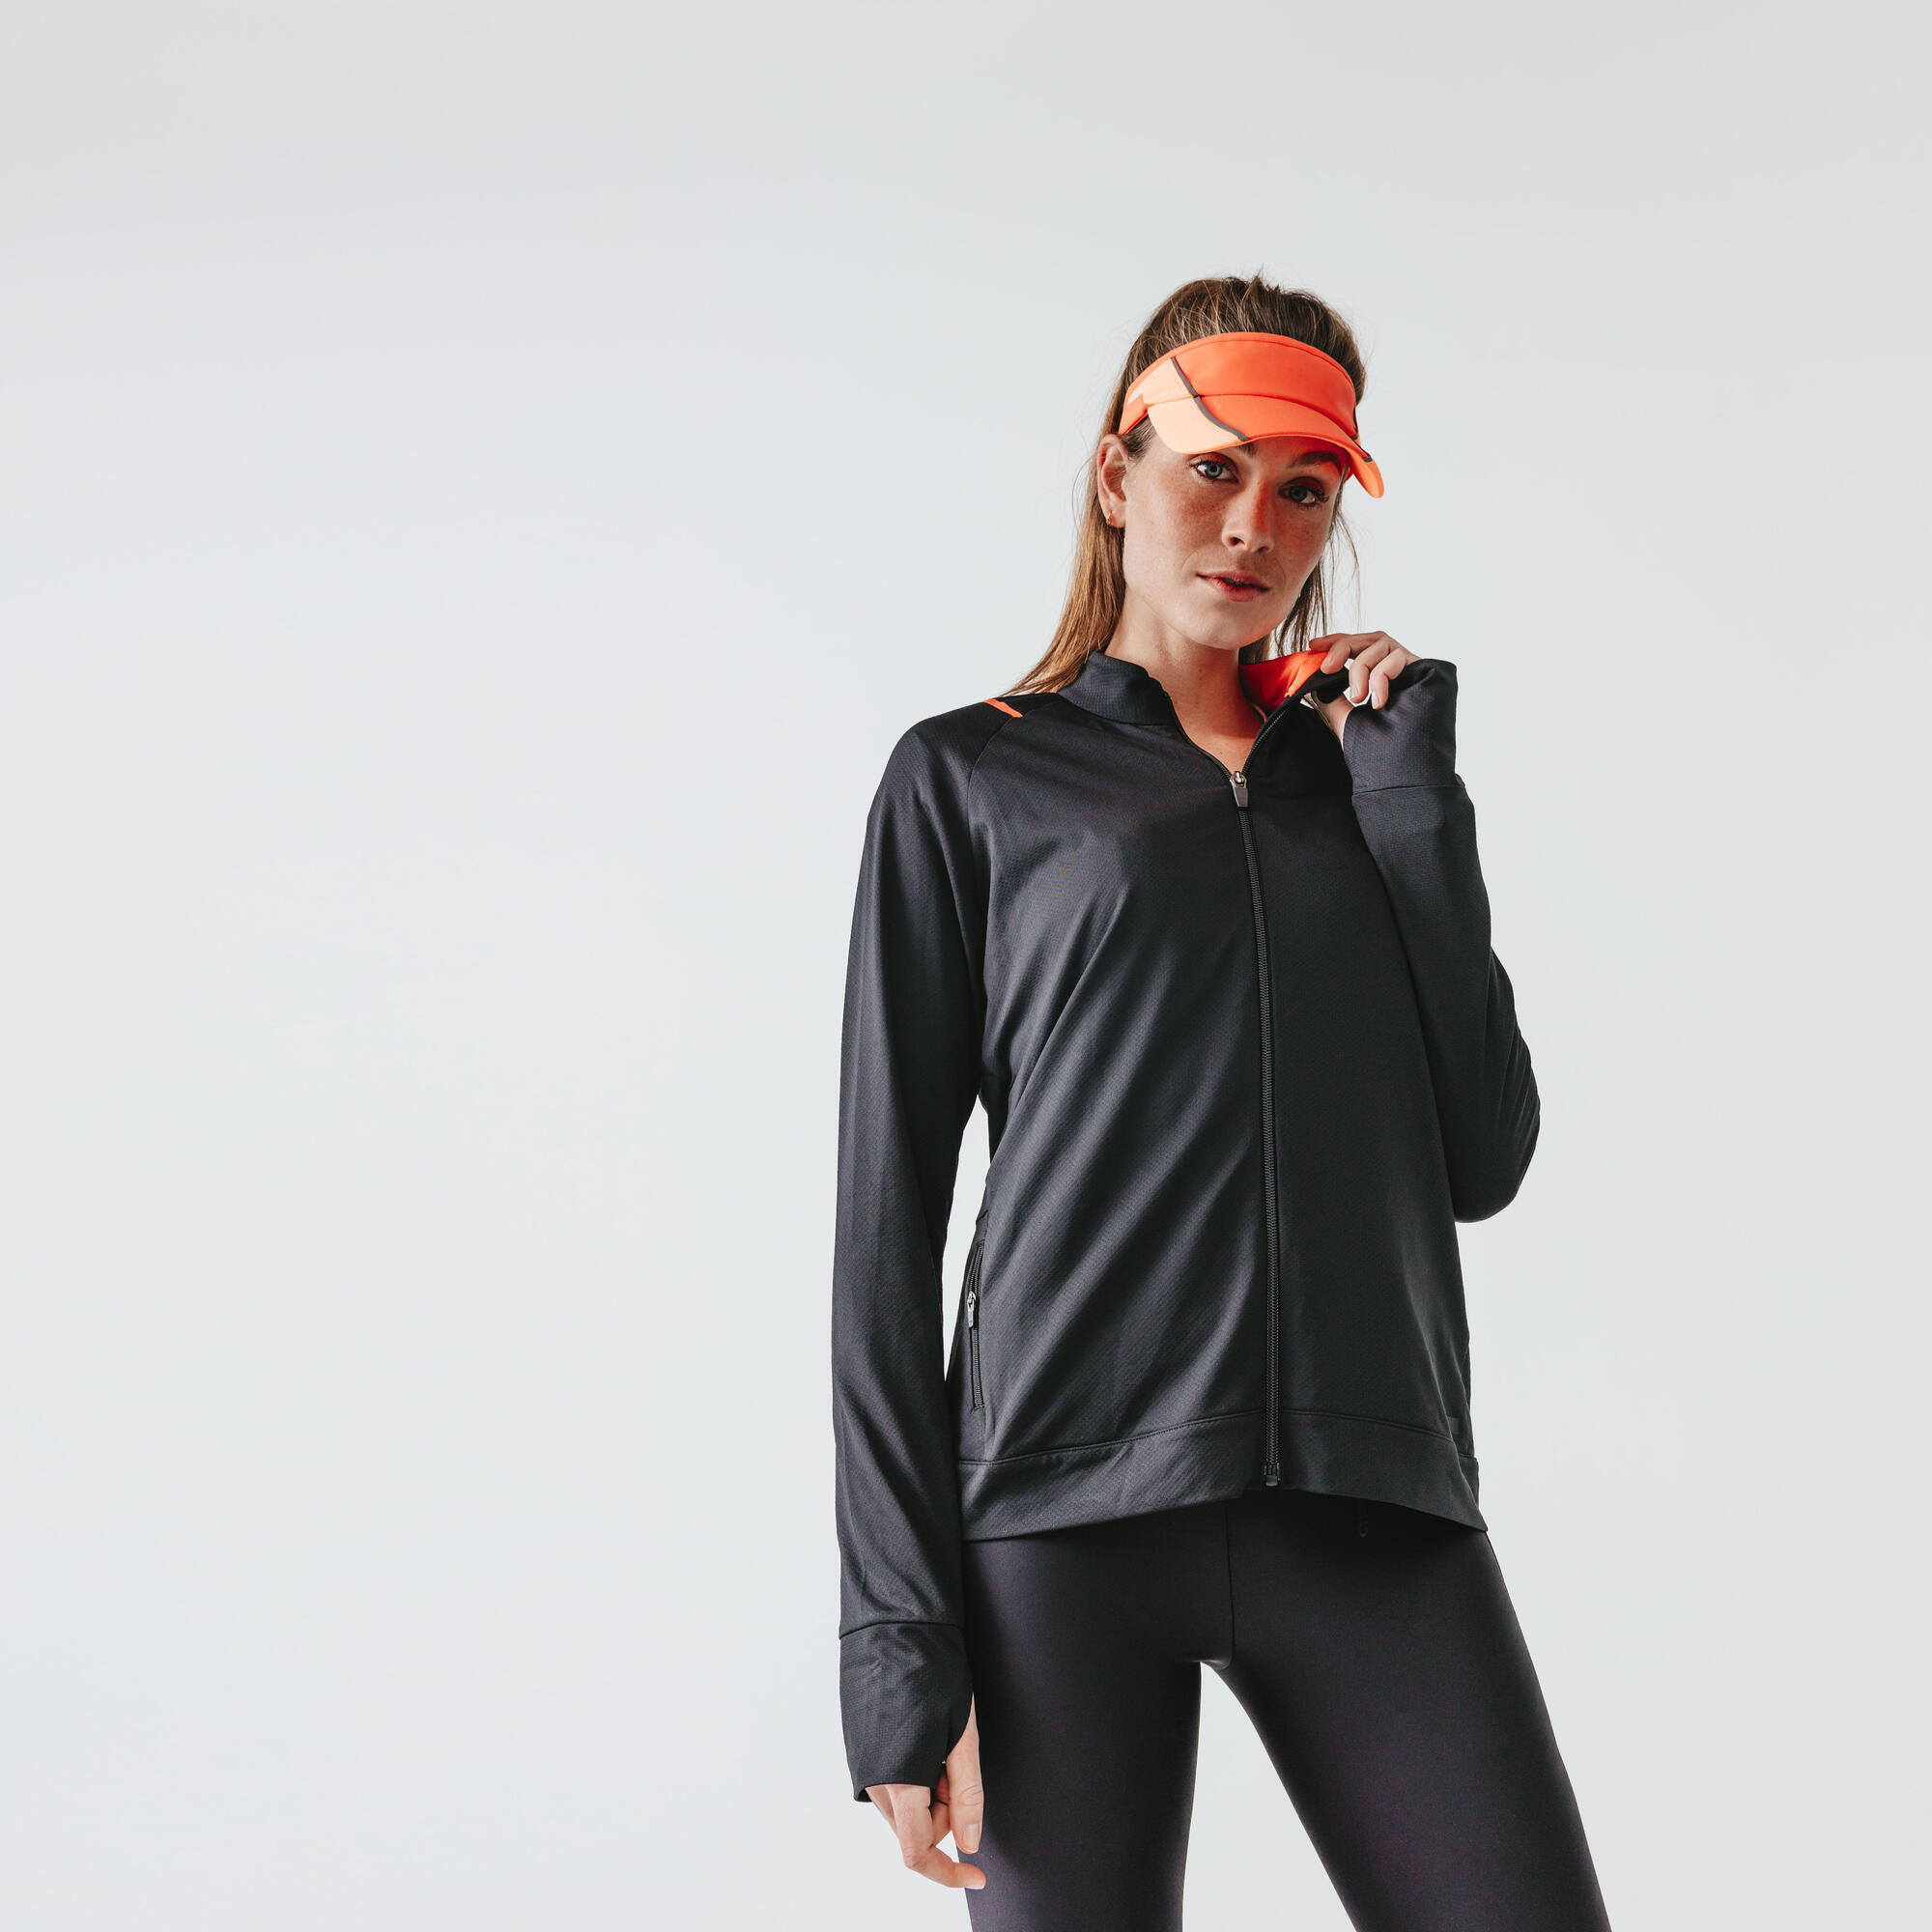 Laufjacke Run Dry Damen schwarz